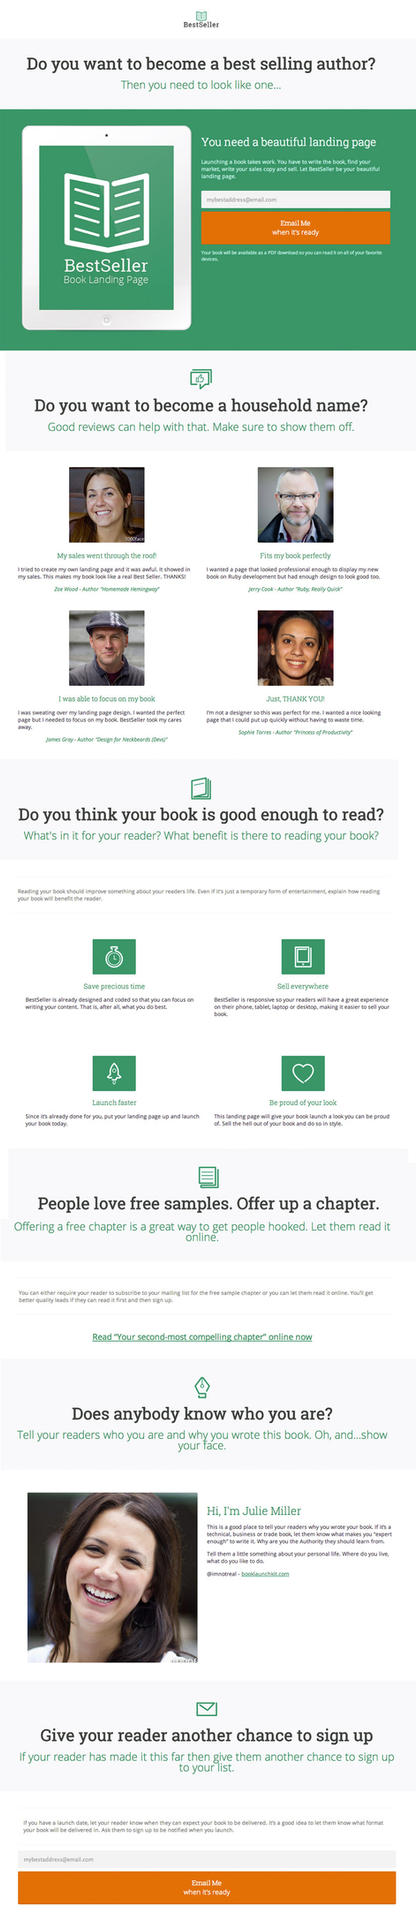 BestSeller Book Landing Page by 723media